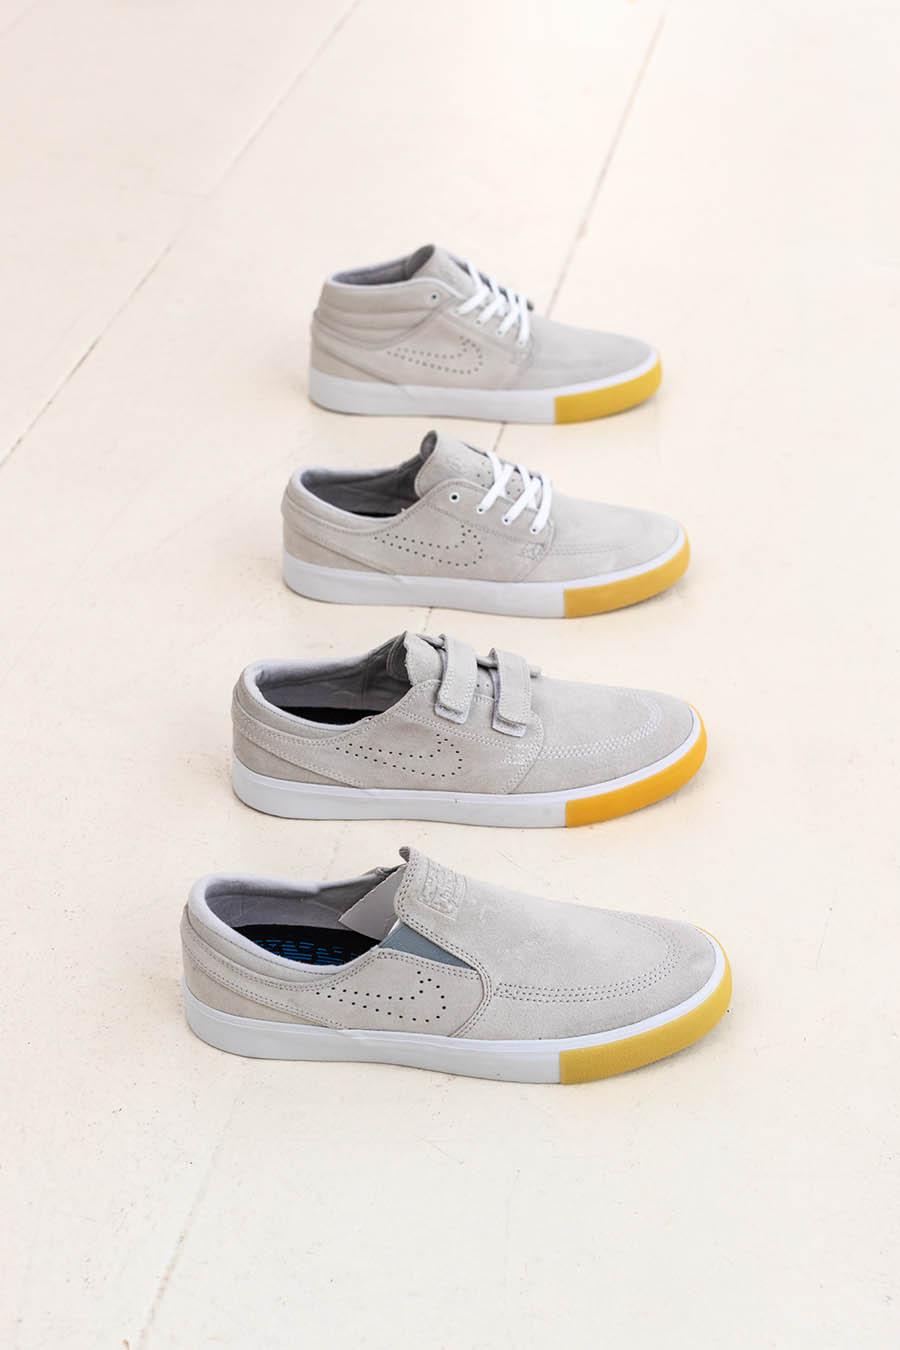 Nike - Janoski Remastered Collection